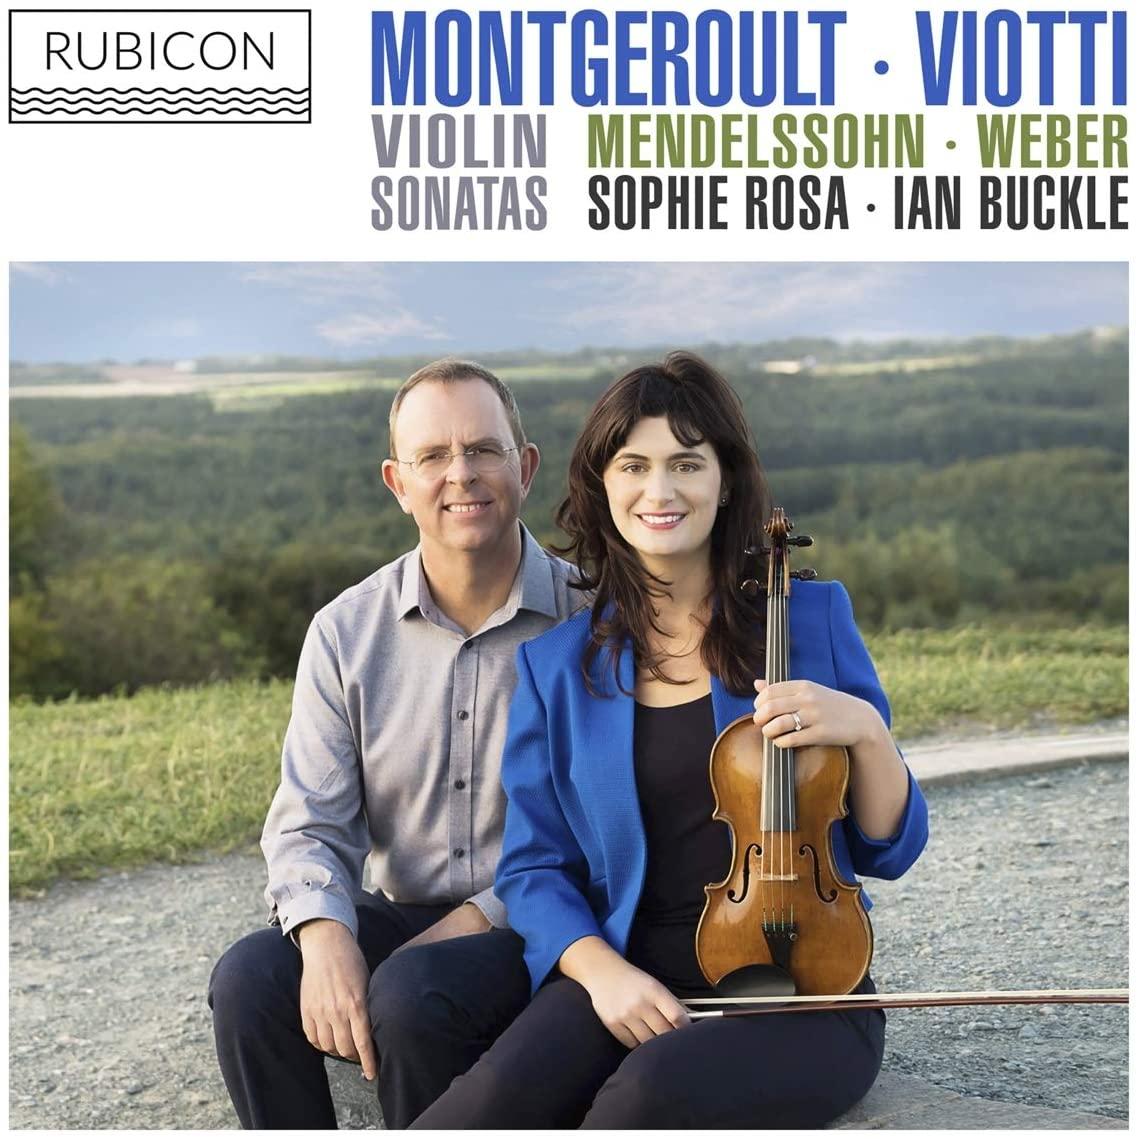 Review of MENDELSSOHN; MONTGEROULT; VIOTTI; WEBER Violin Sonatas (Sophie Rosa)